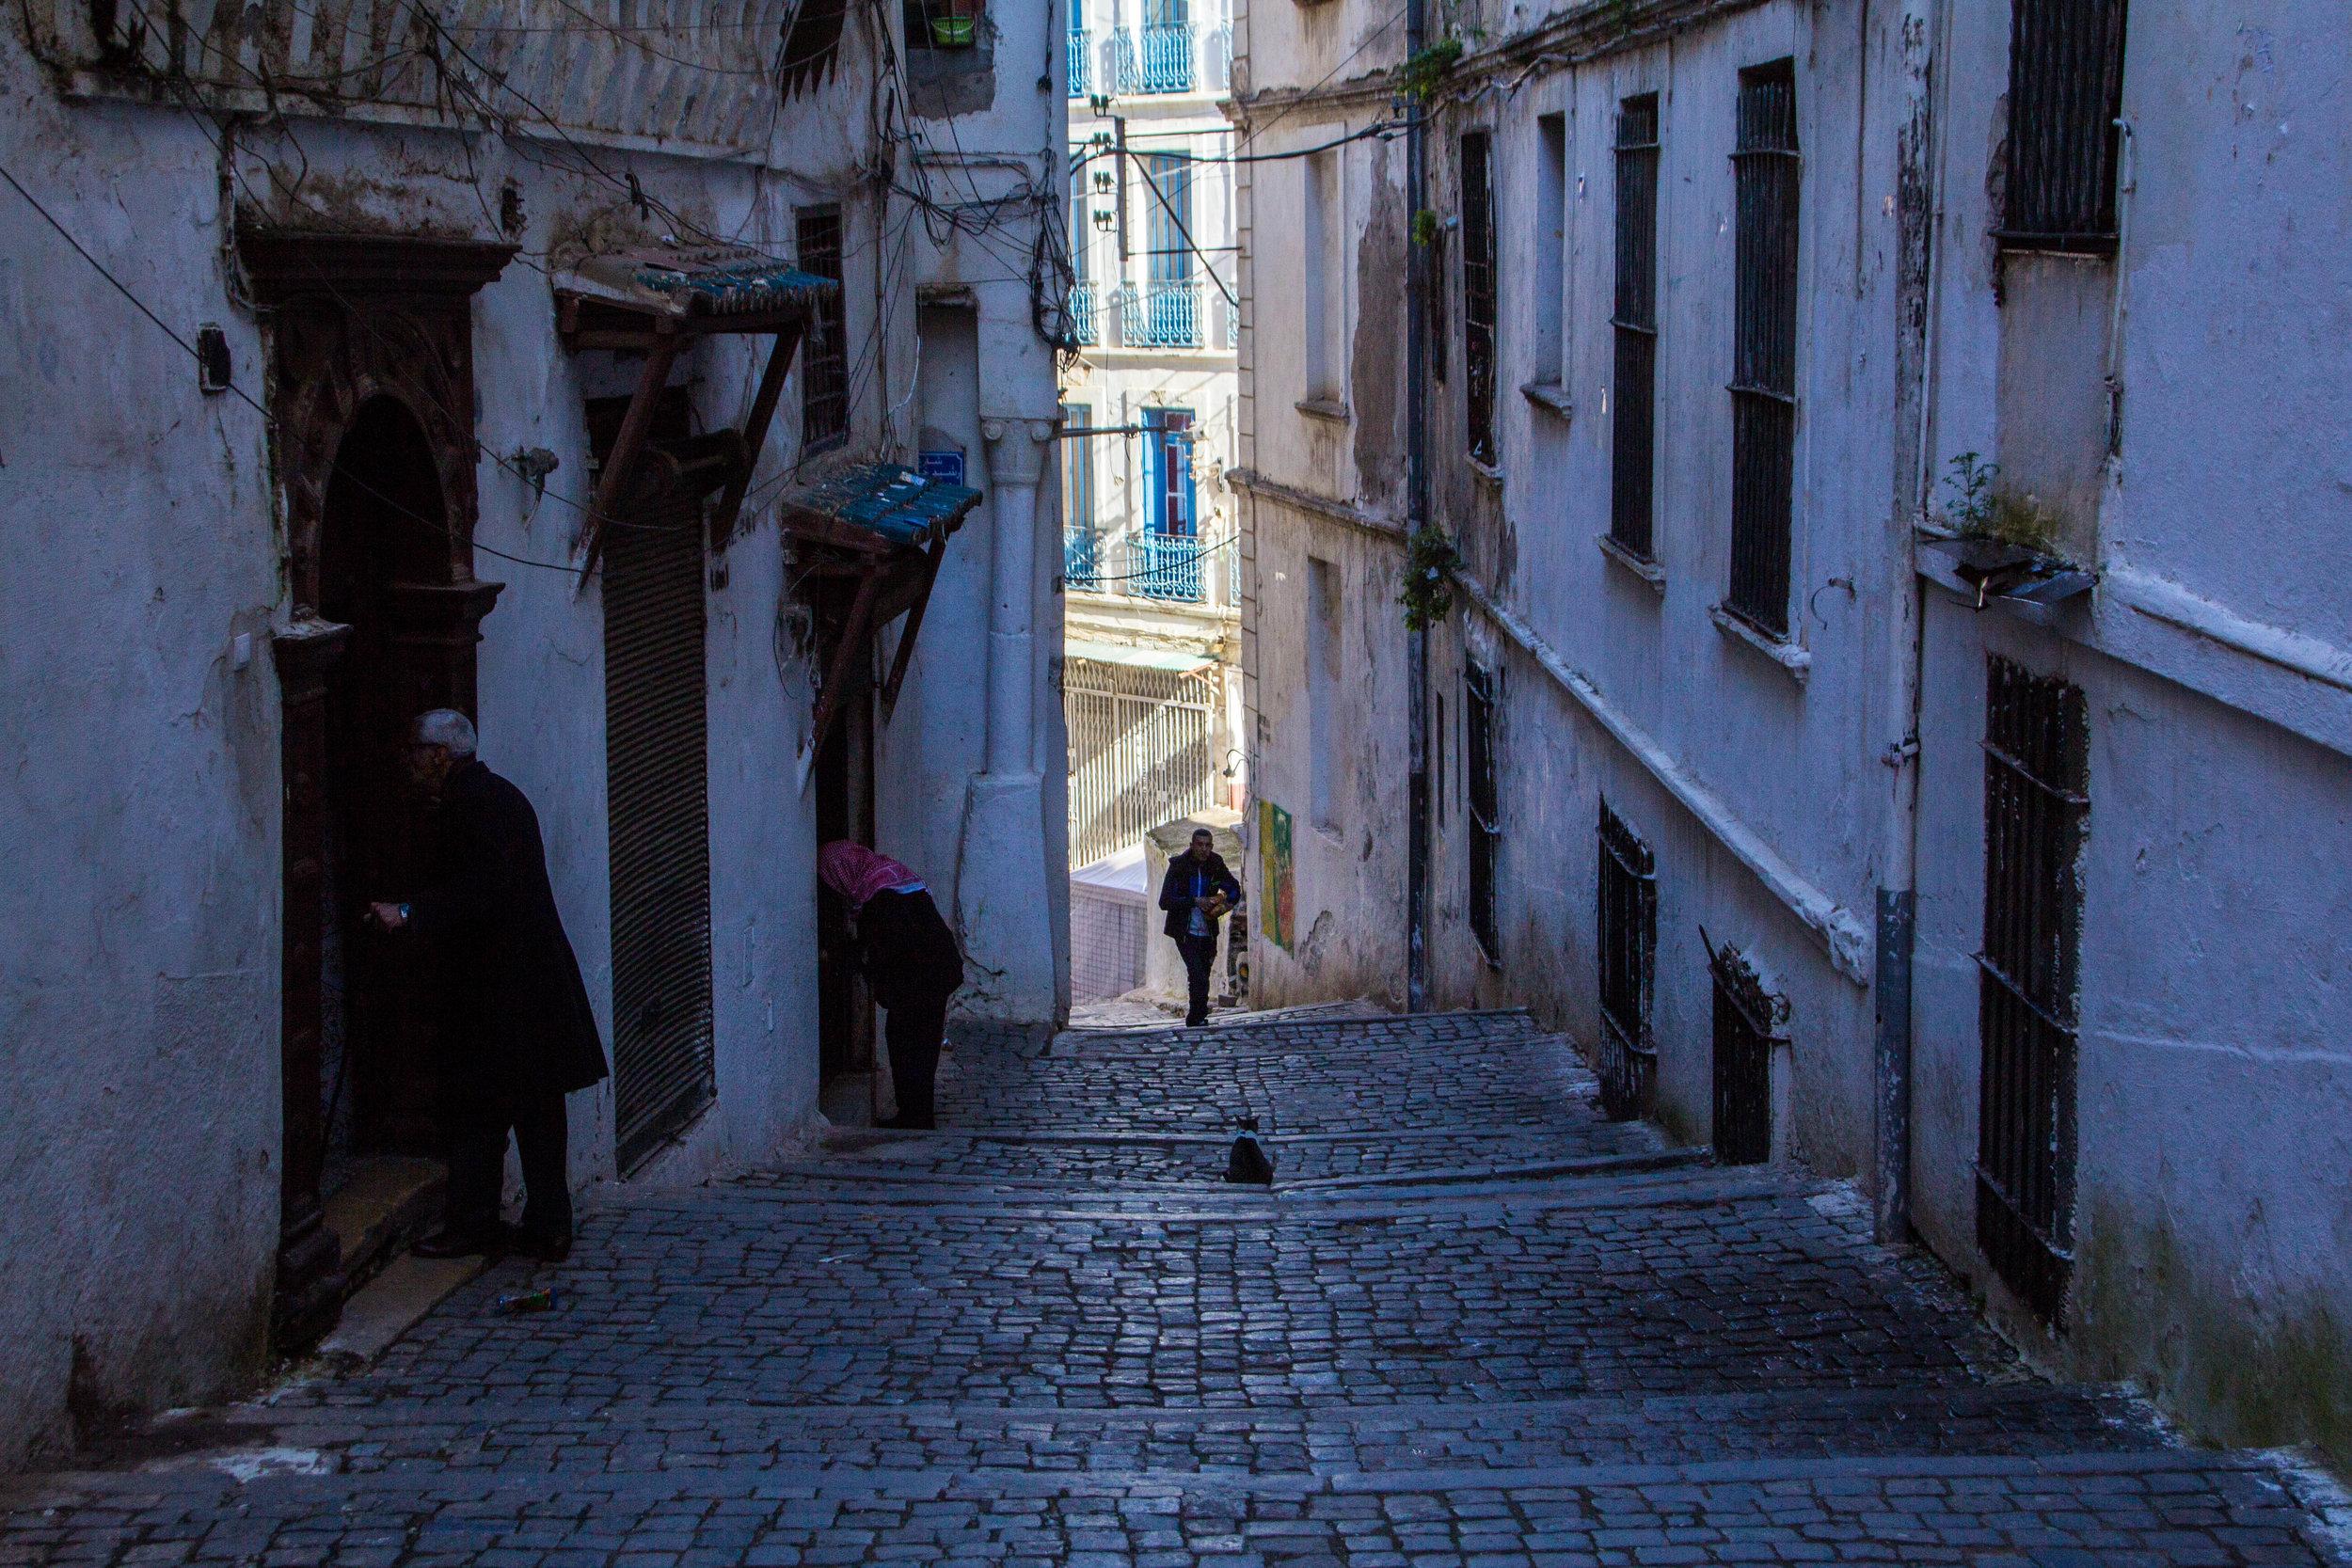 casbah-photography-algiers-algeria-alger-61.jpg